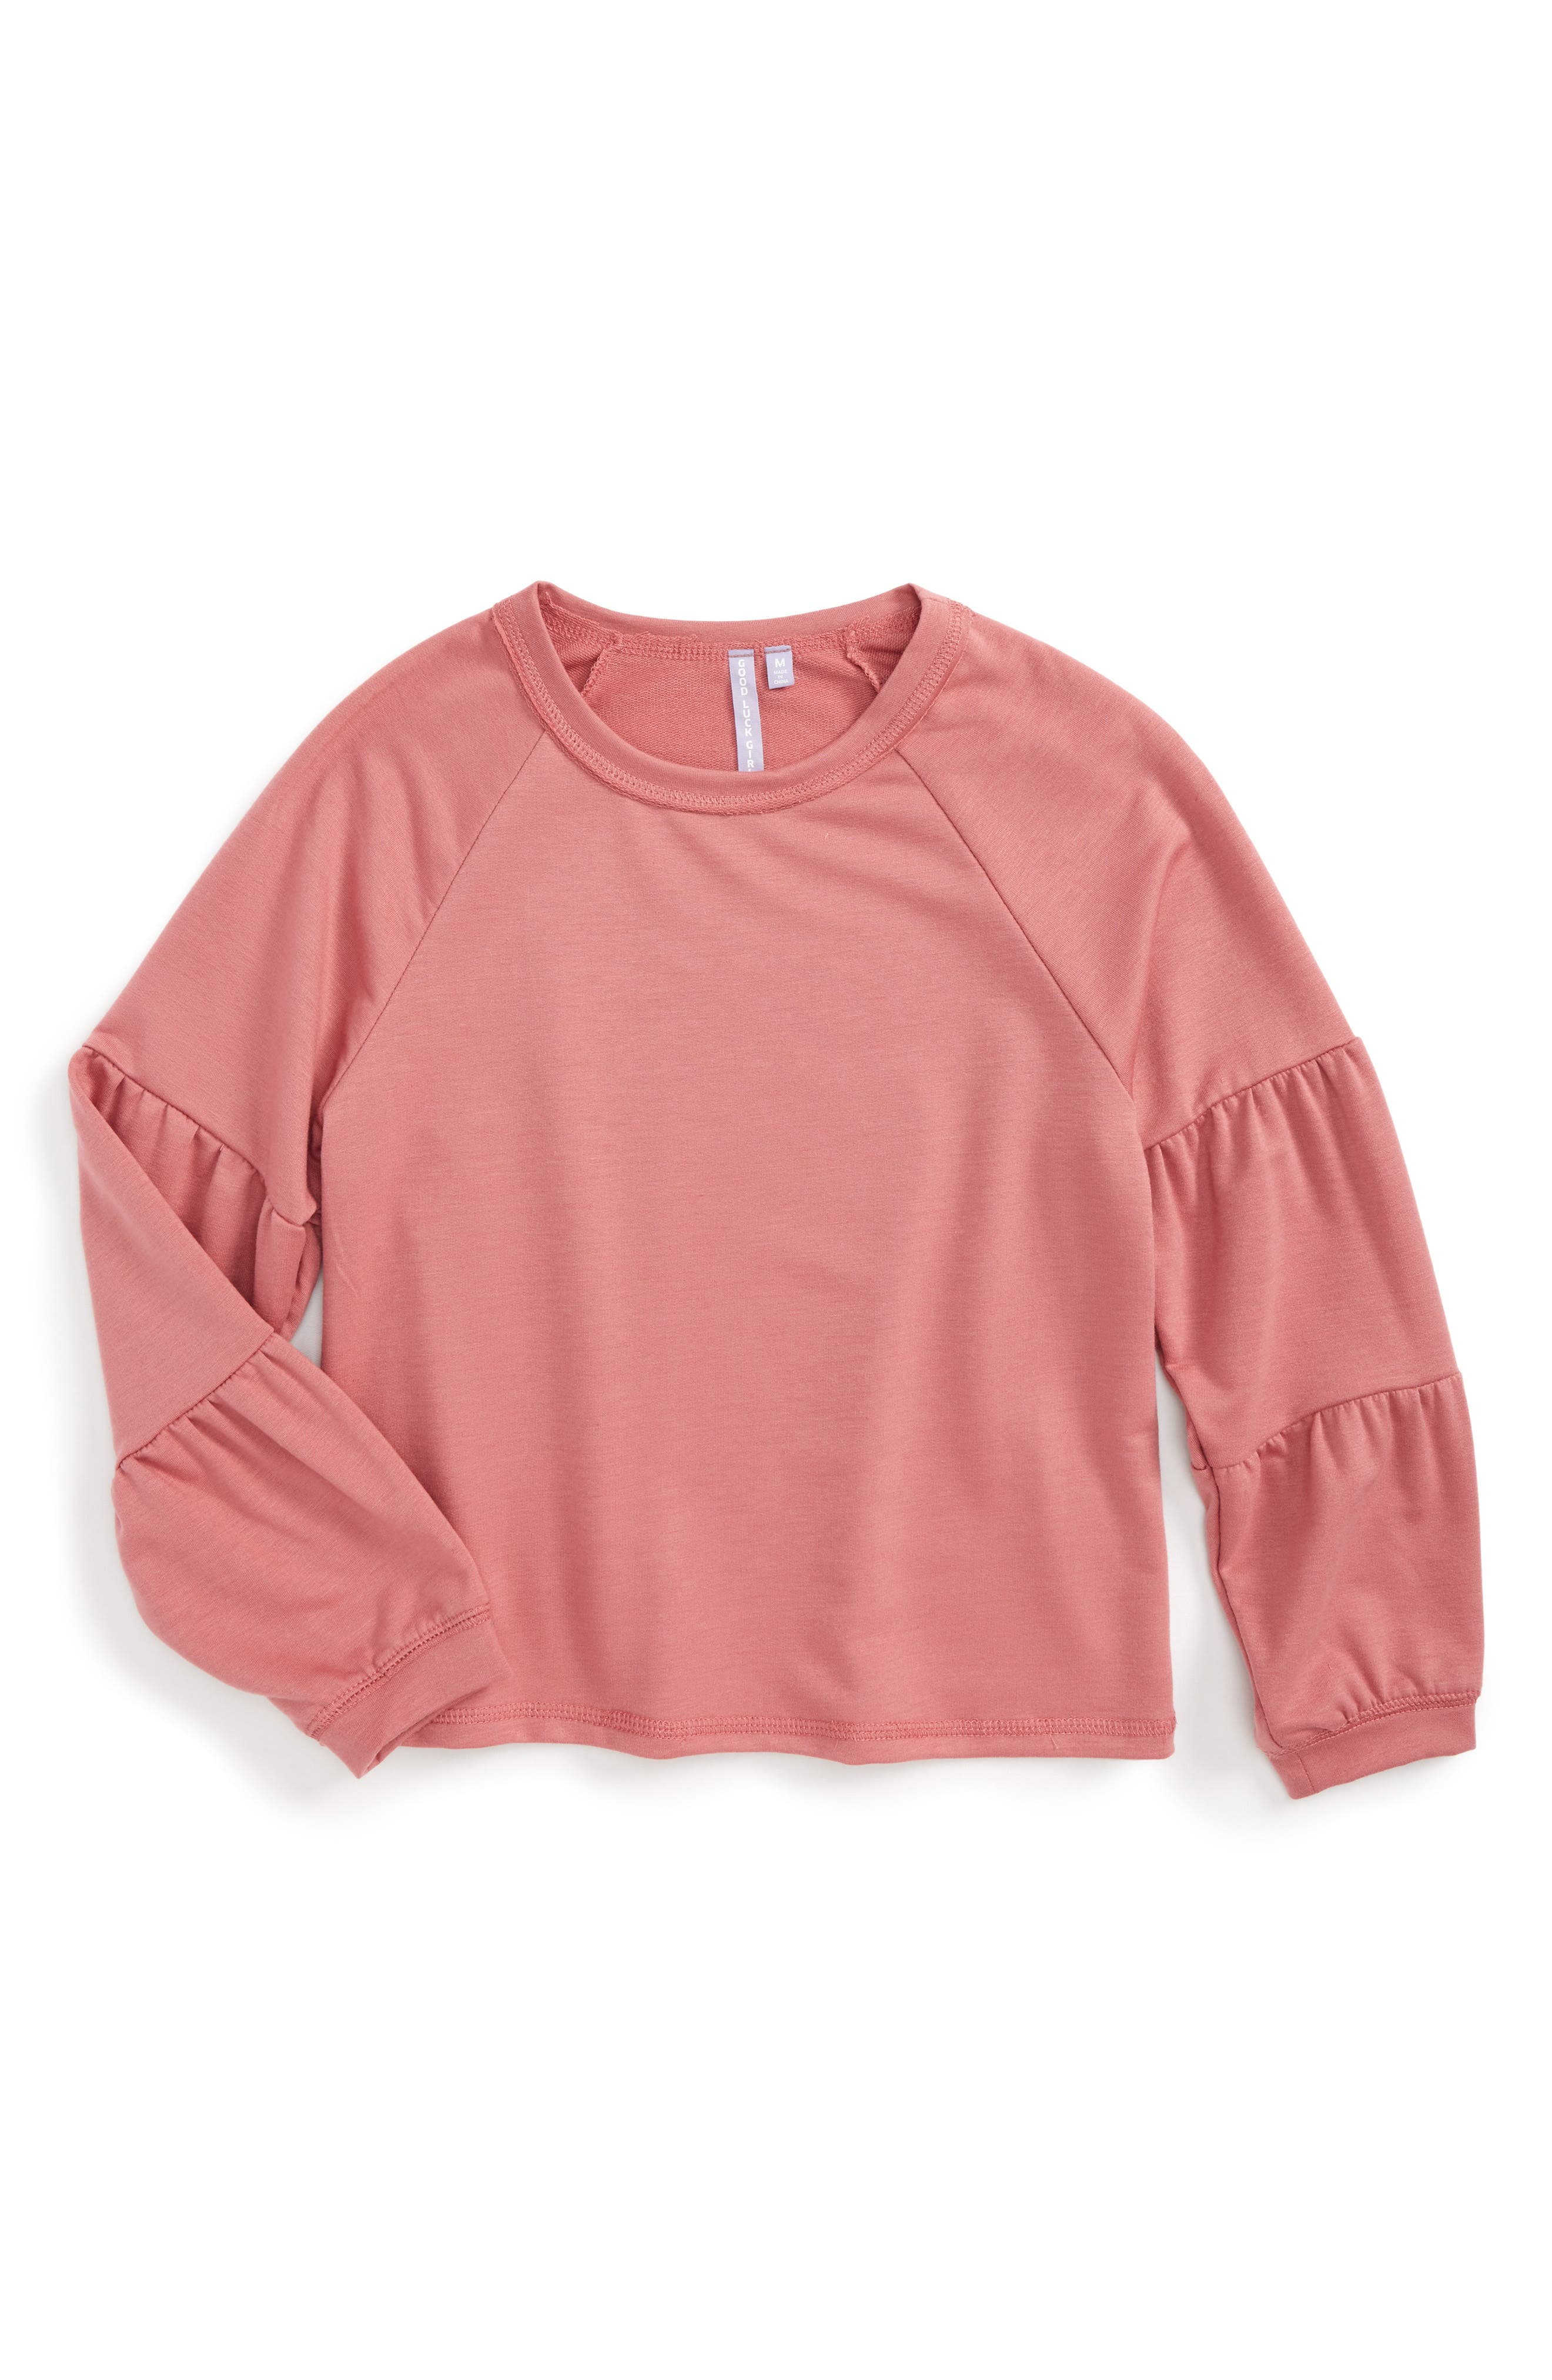 Tiered Sleeve Sweatshirt,                         Main,                         color, Mauve